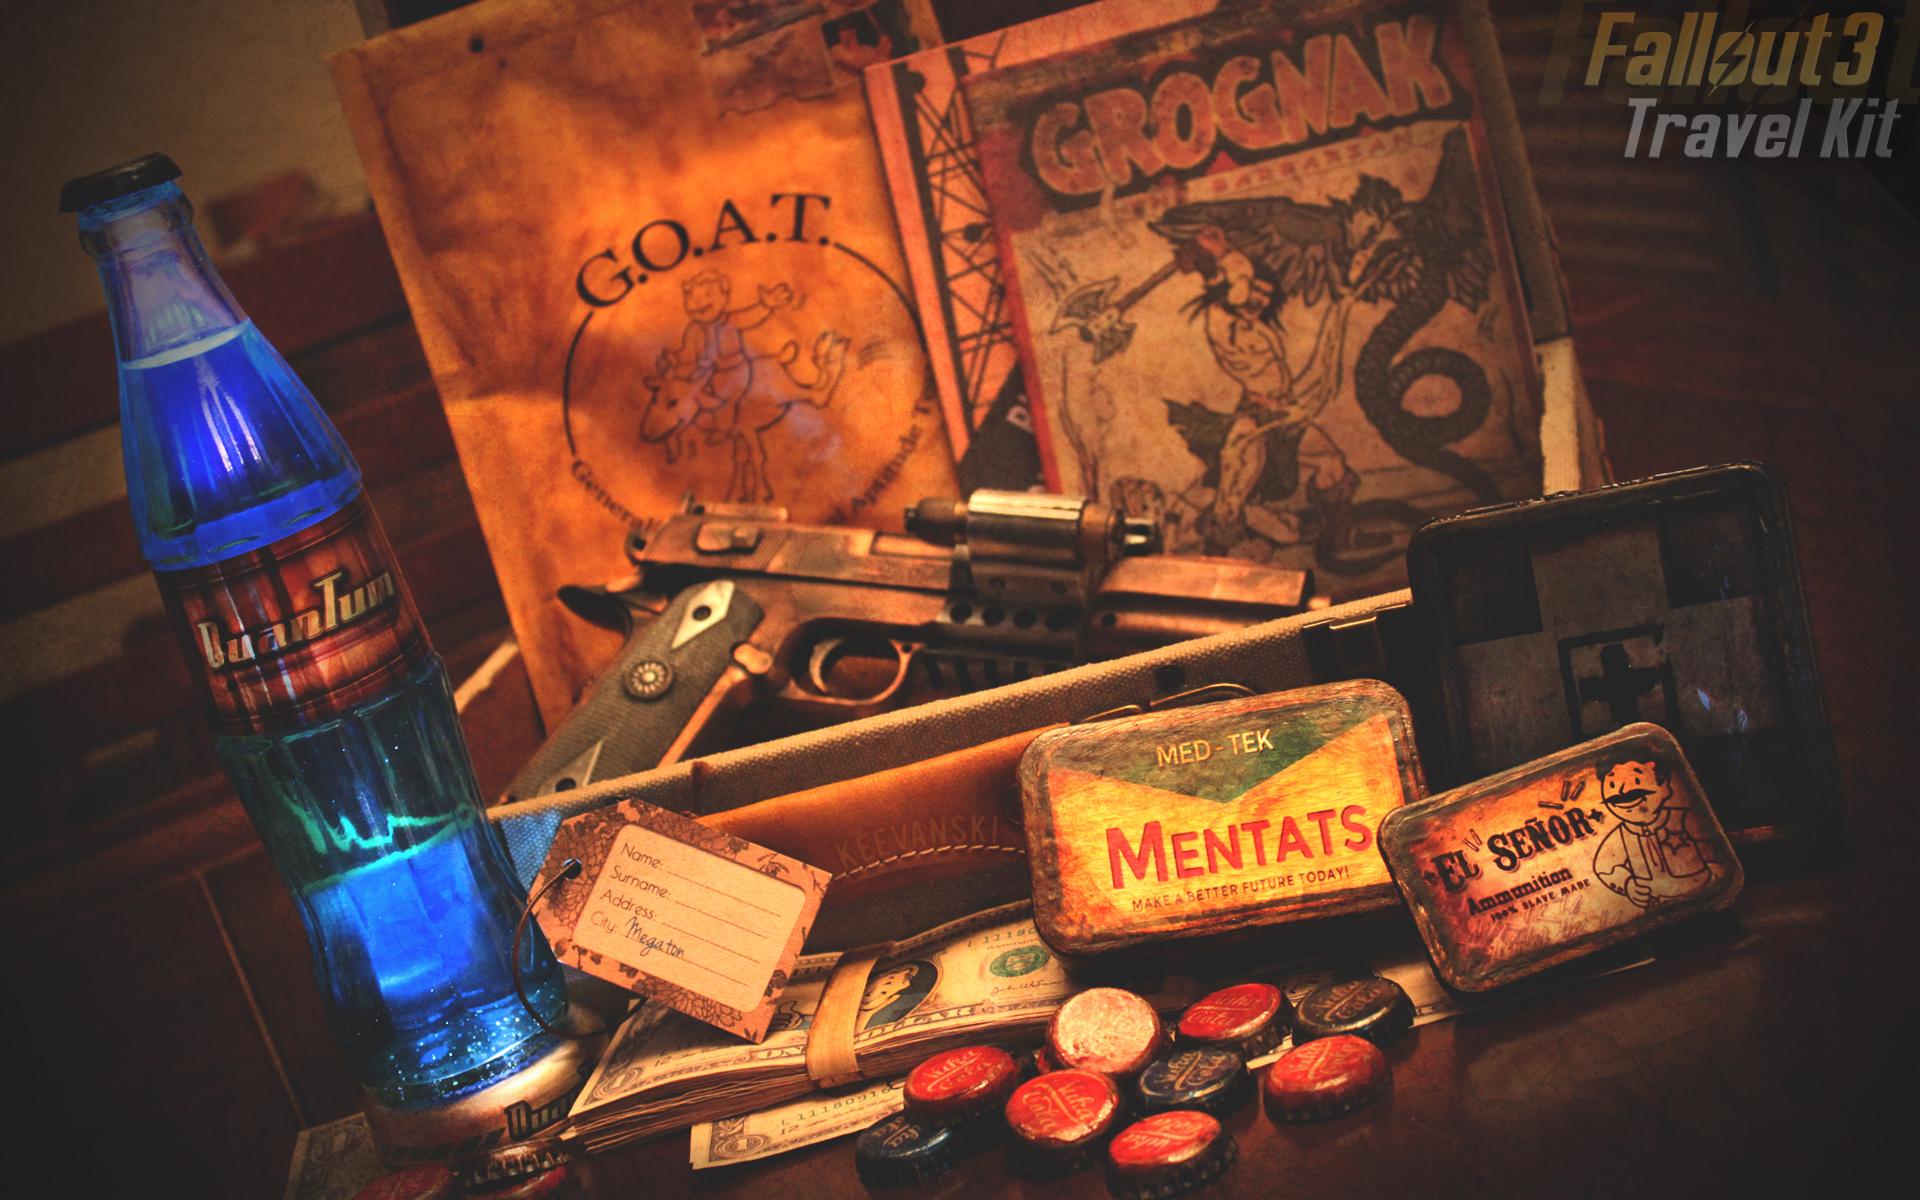 Fallout 3 Travel Kit + Downloads